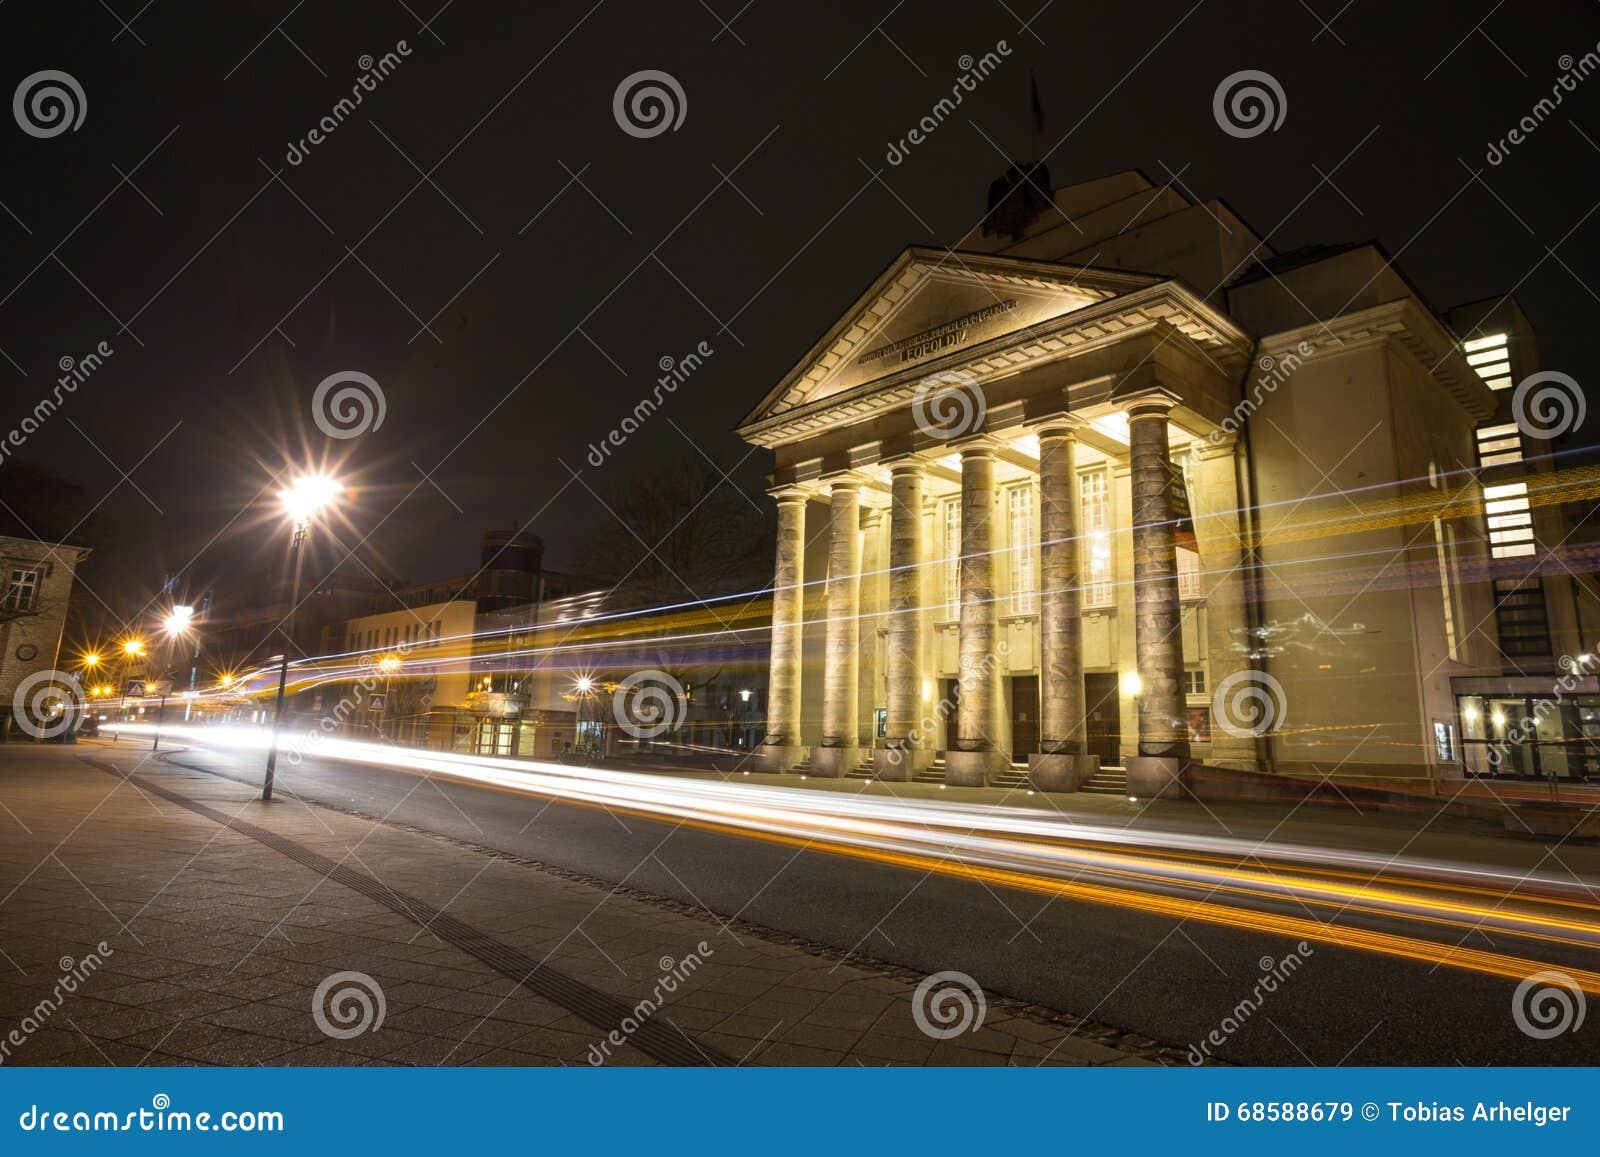 Detmold Германия театра в вечере с светофорами